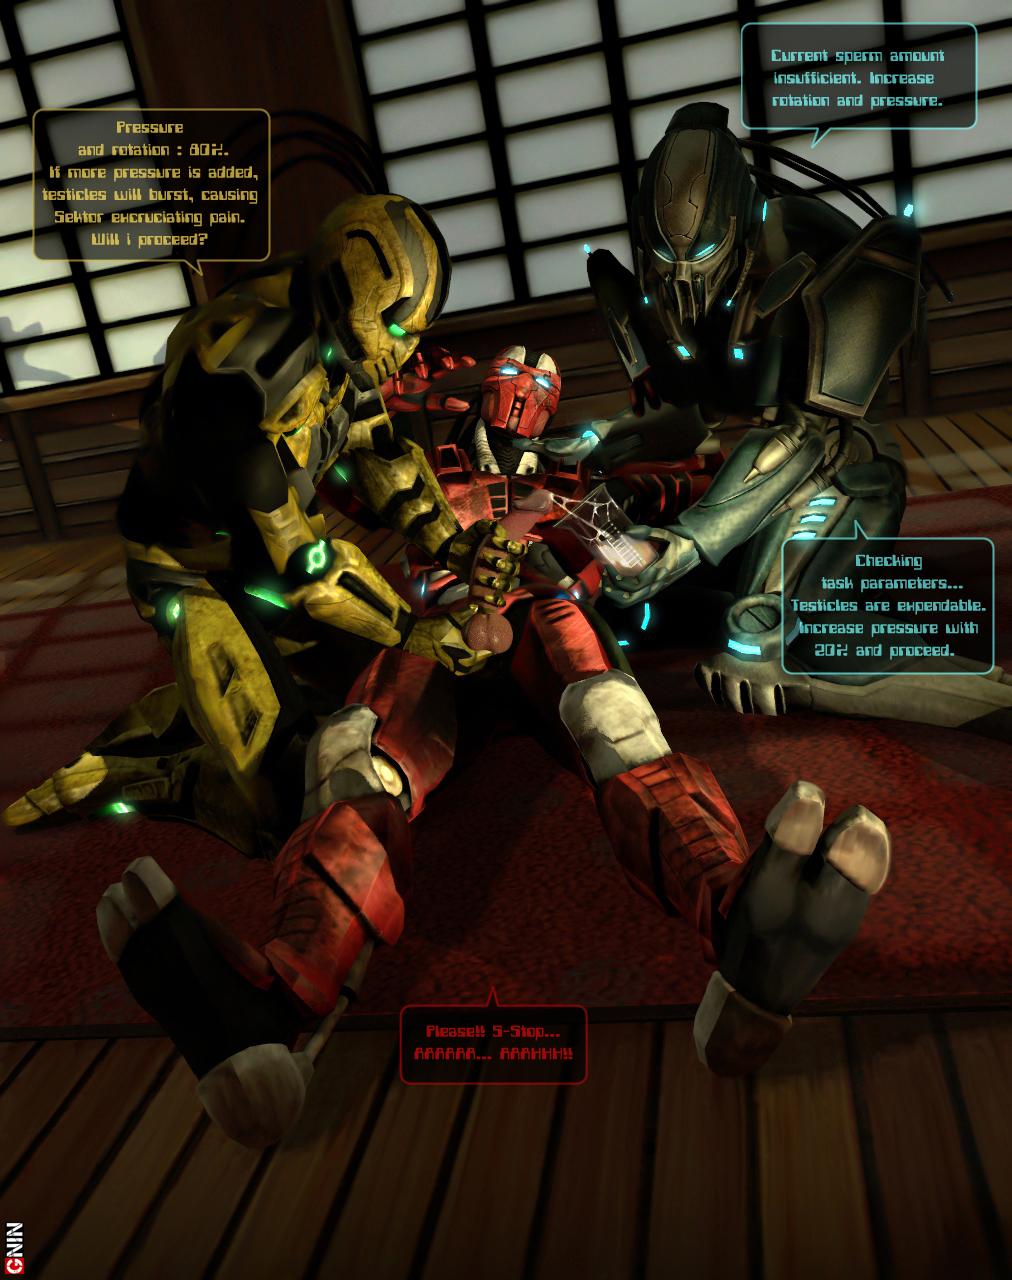 Mortal kombat sex photo gallery, jena action girl